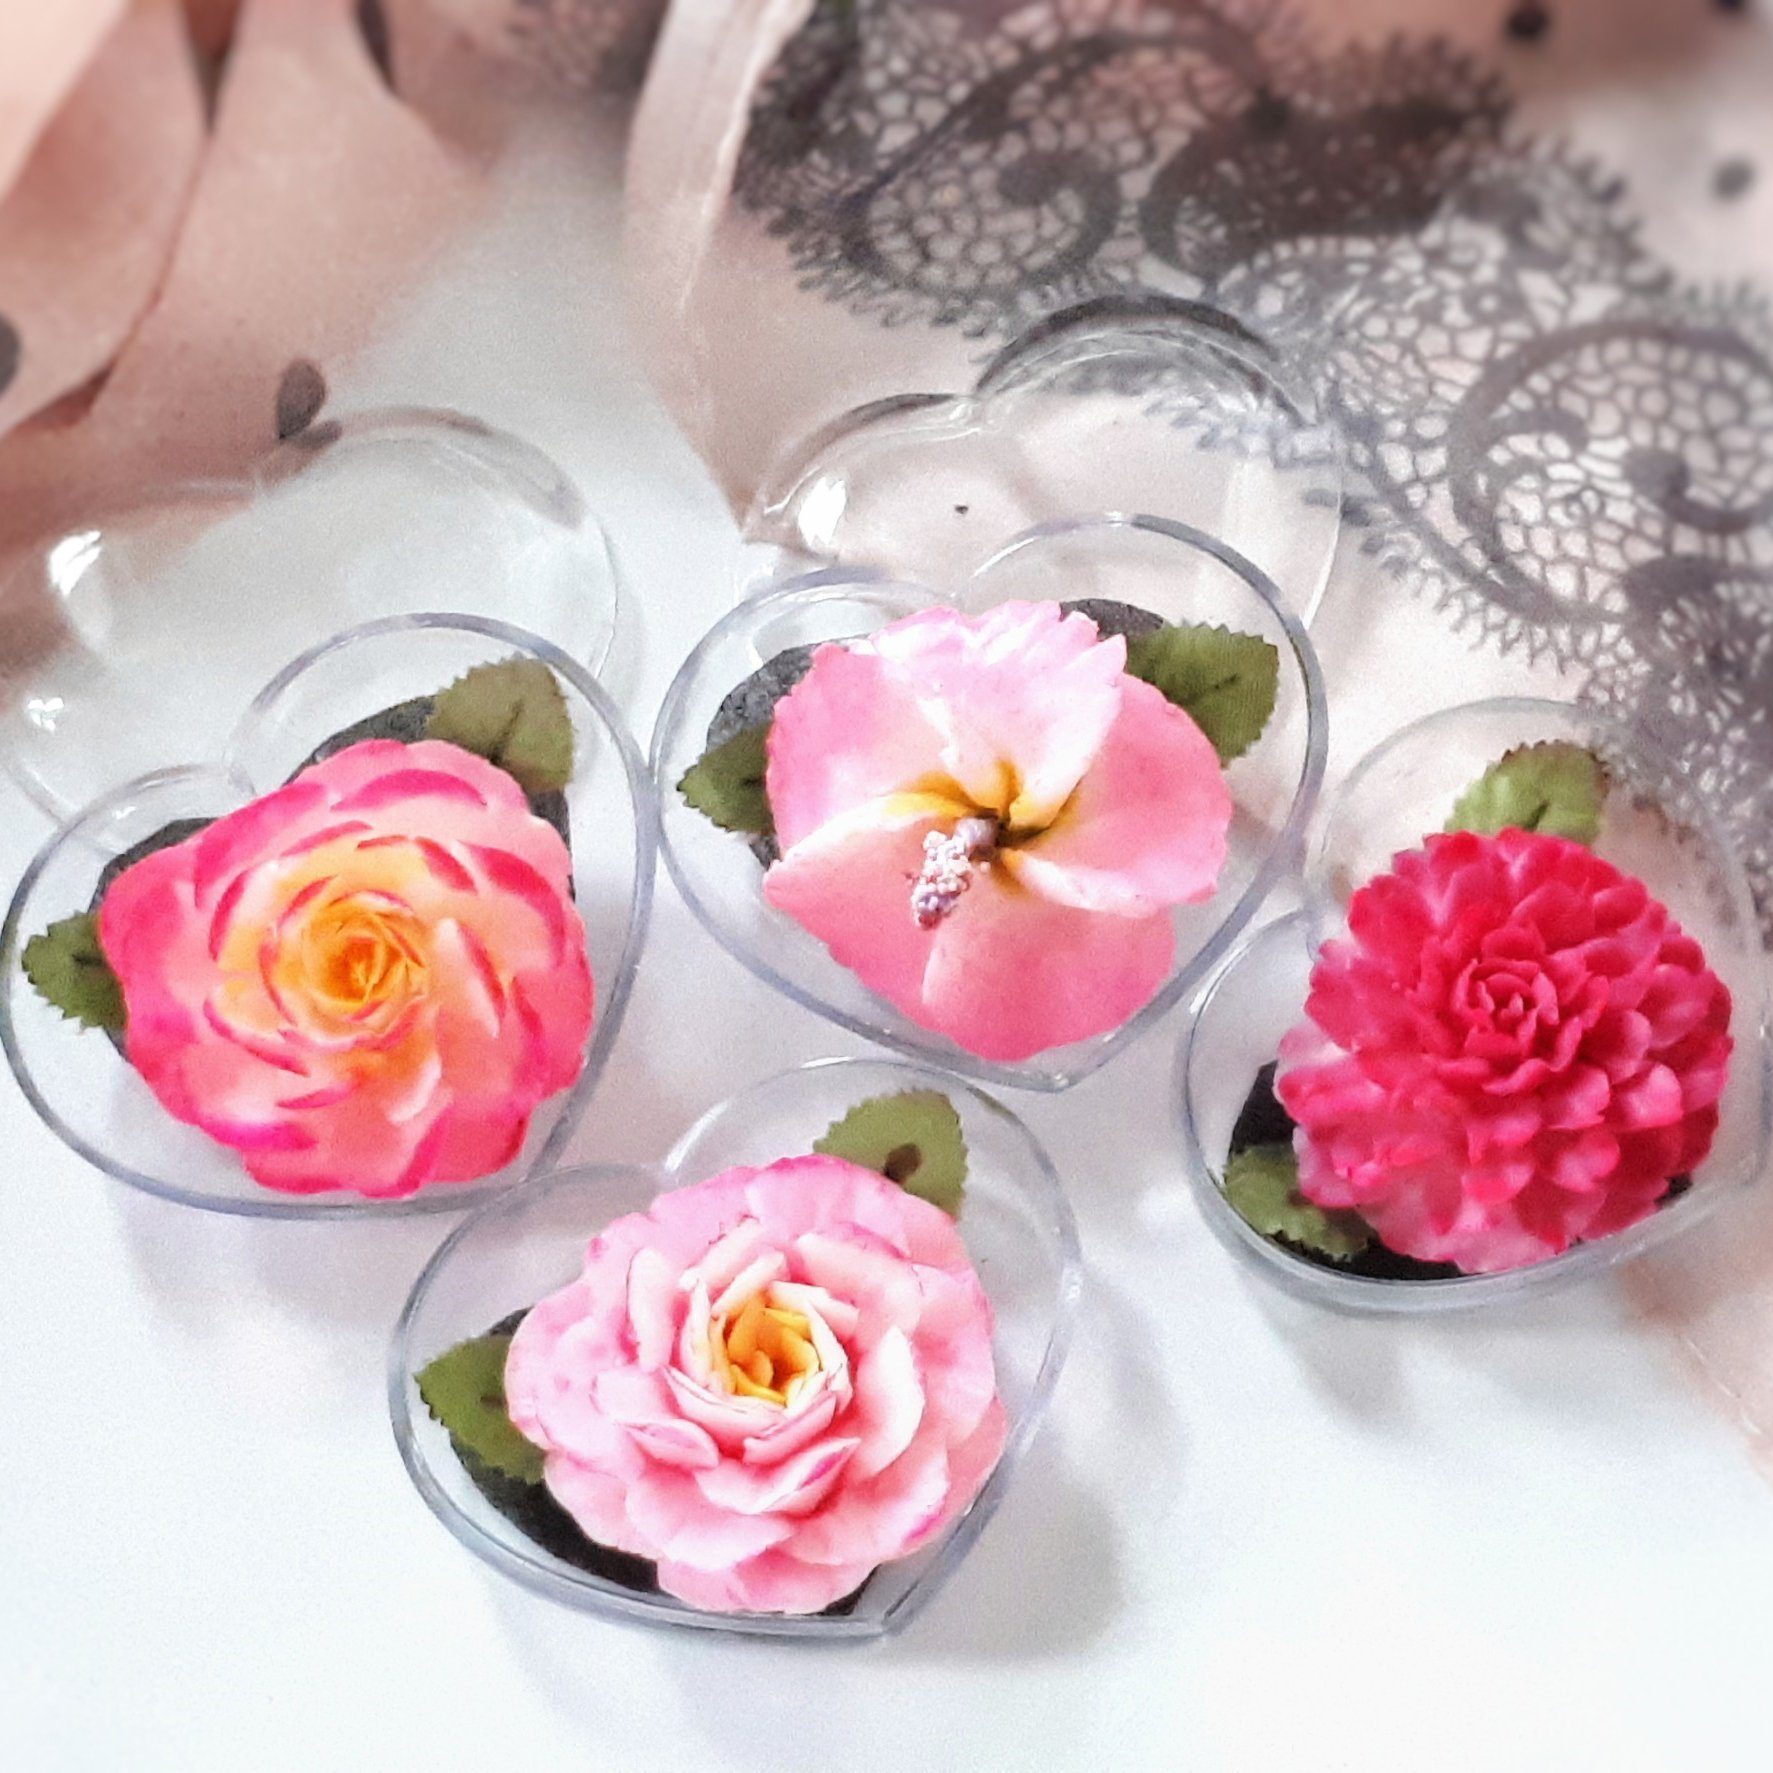 Valentine Pink Flower Set of 4 Hand Carved Decorative Soaps with Jasmine Aroma Essential Oil, Handmade by Thai Artisan. Love Valentine's day